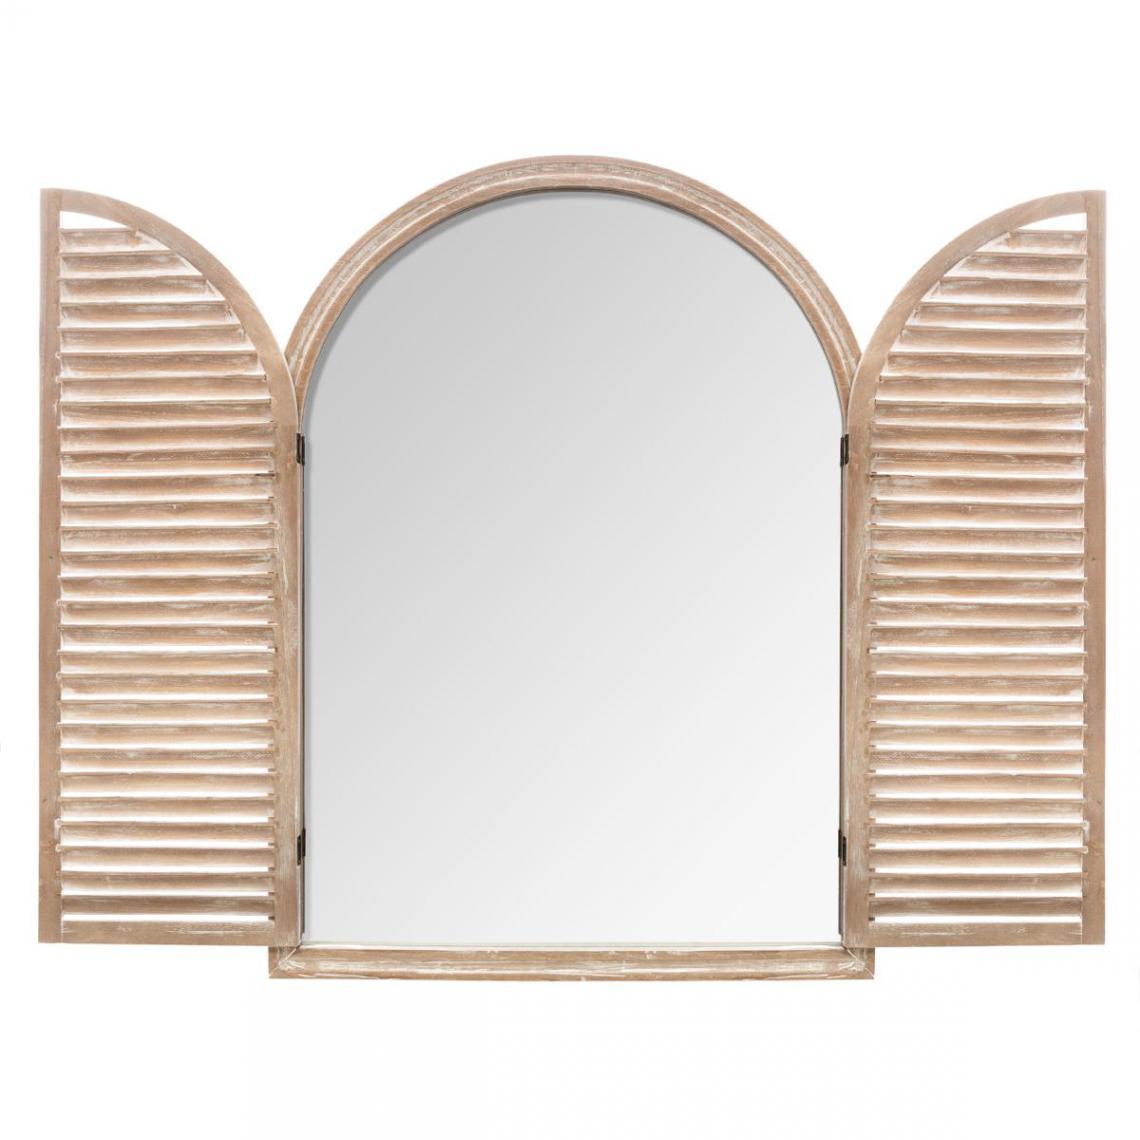 Miroir A Volet 74x104 Blanc Shutery 3 Suisses